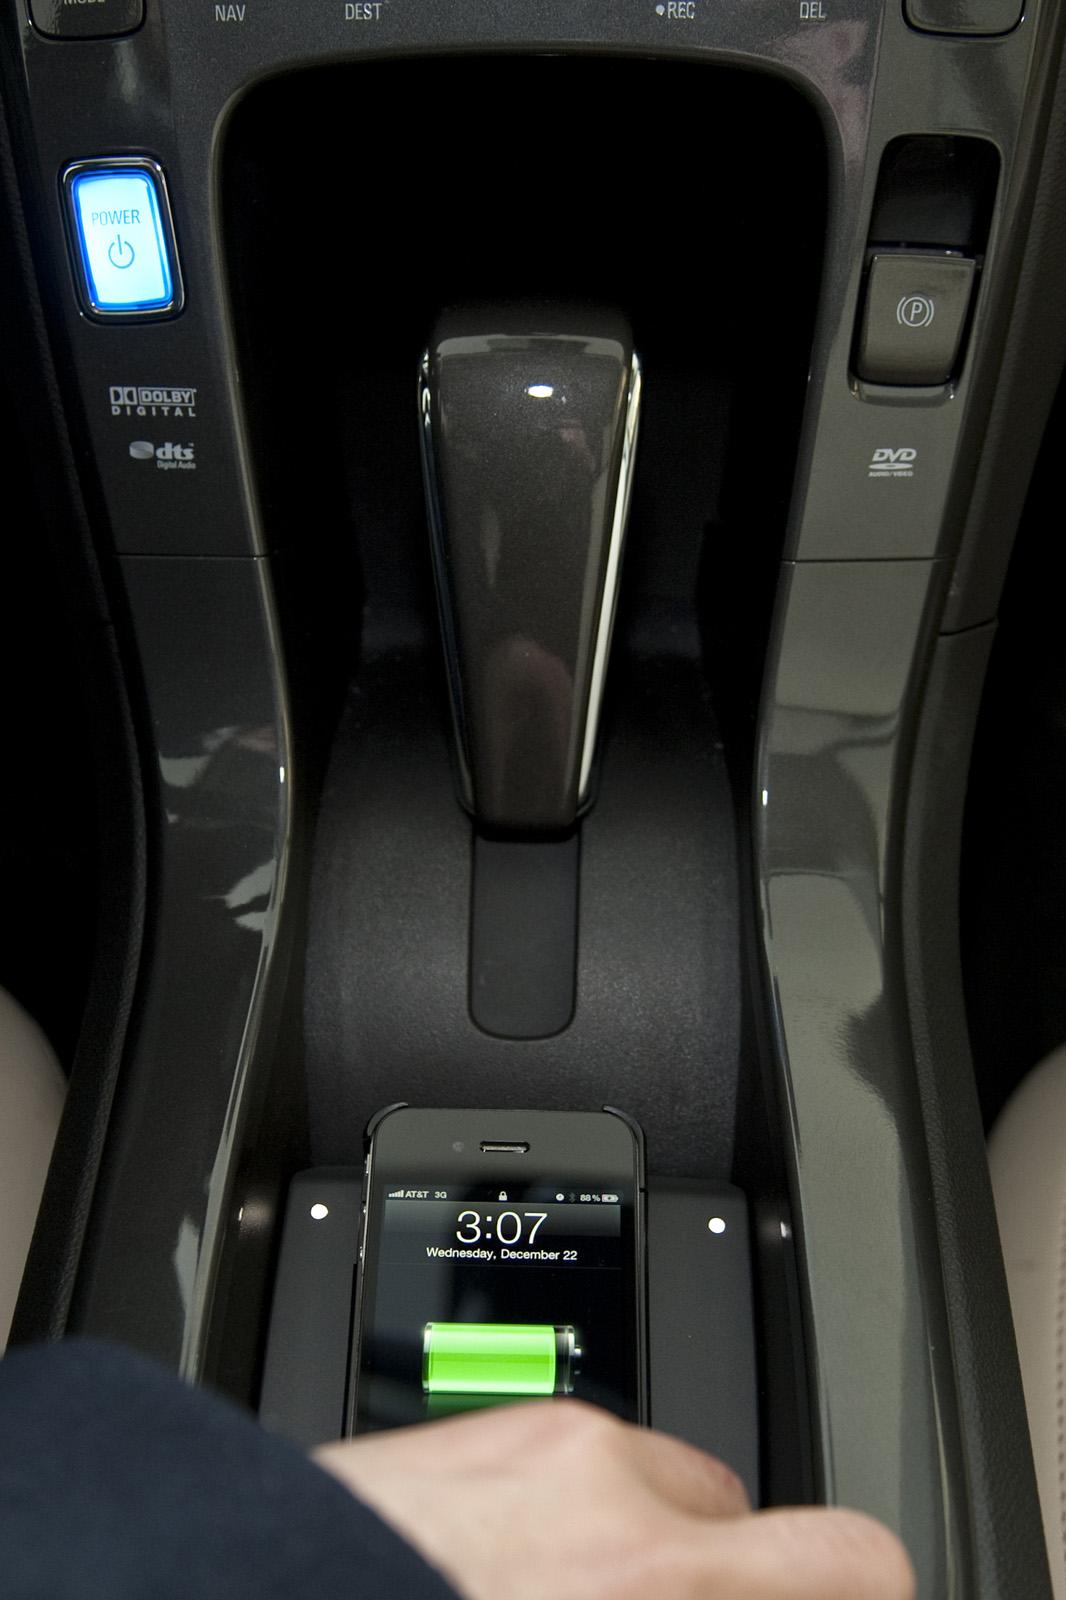 5 Mat Iphone Charging 4